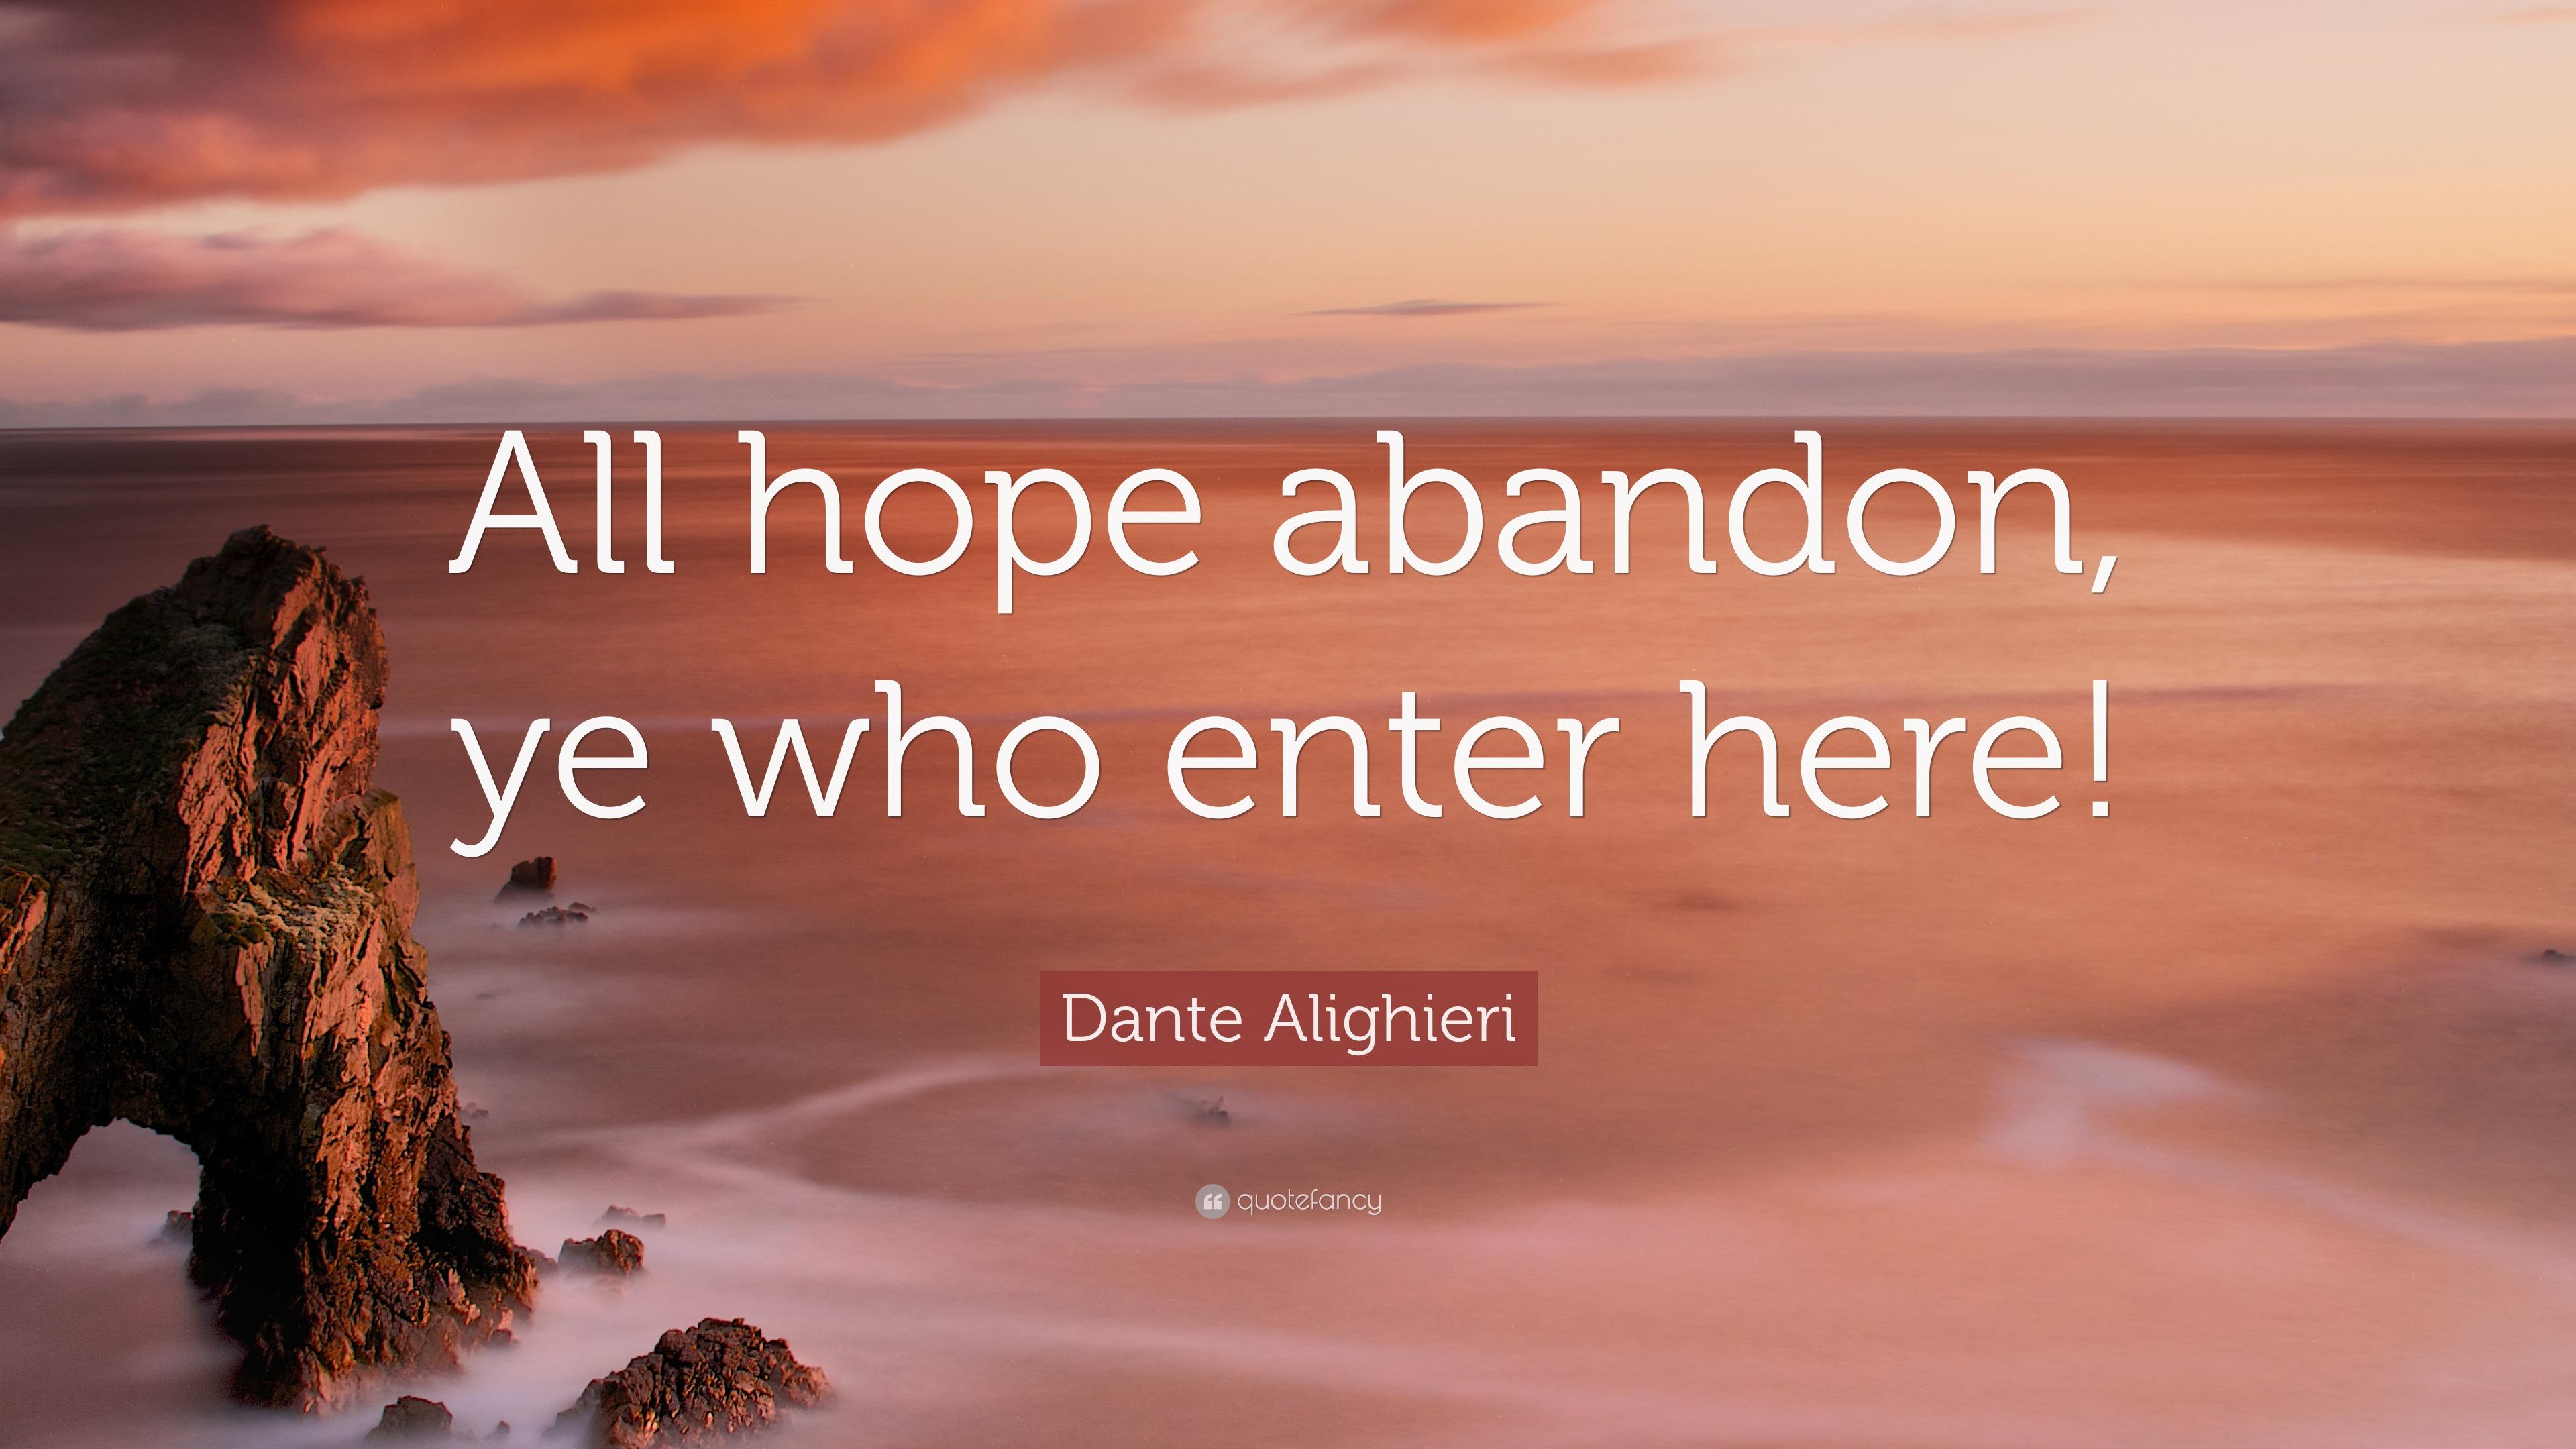 4692821-Dante-Alighieri-Quote-All-hope-abandon-ye-who-enter-here.jpg